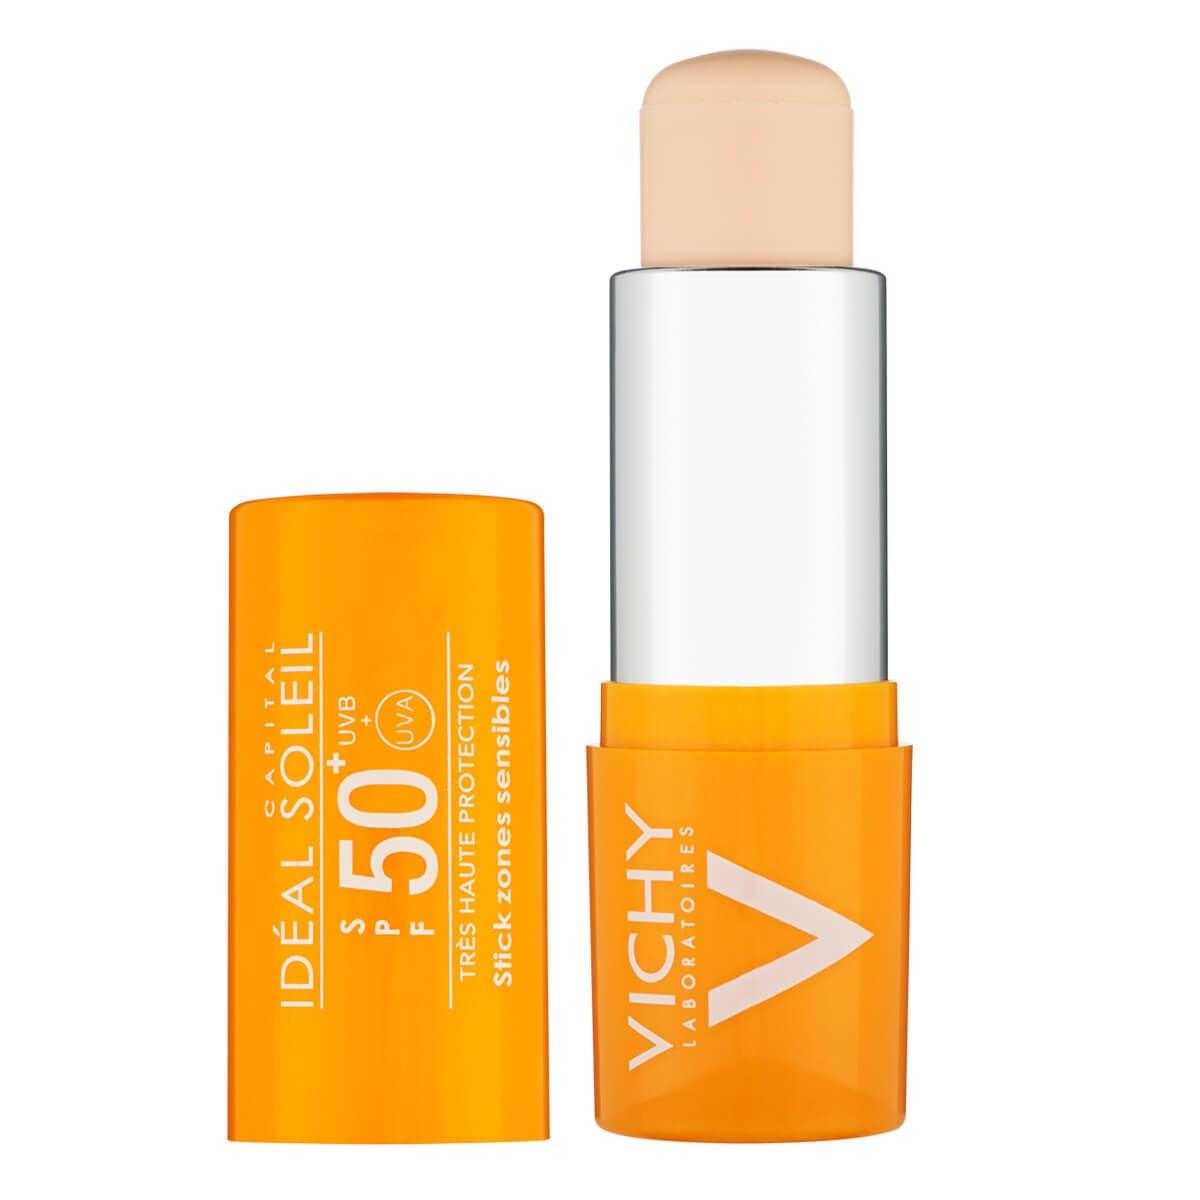 Vichy Idéal Soleil UV Stick SPF 50+